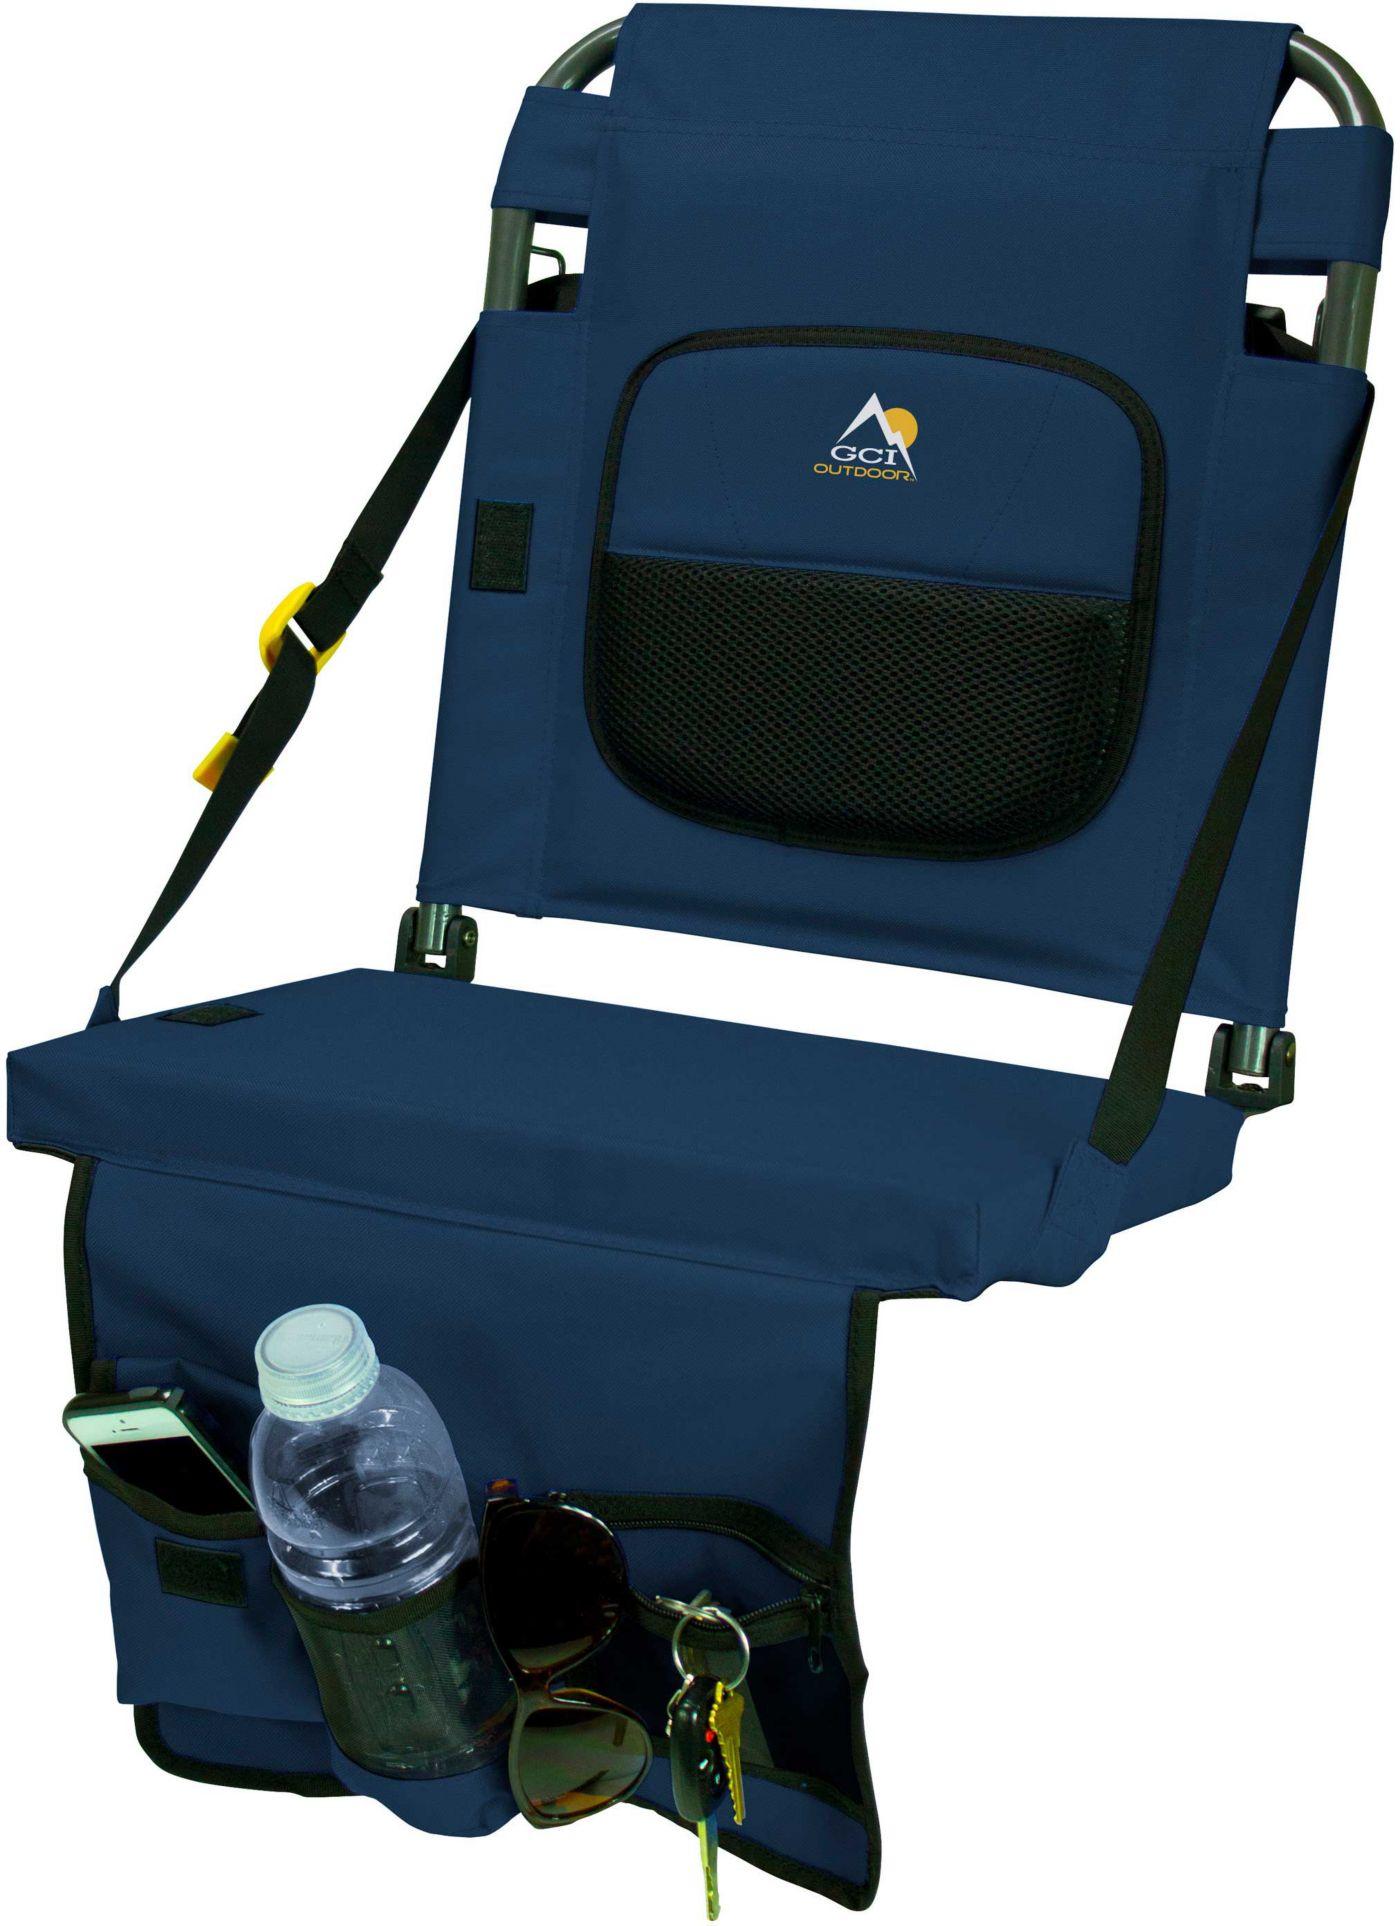 GCI Outdoor BleacherBack Lumbar Stadium Seat